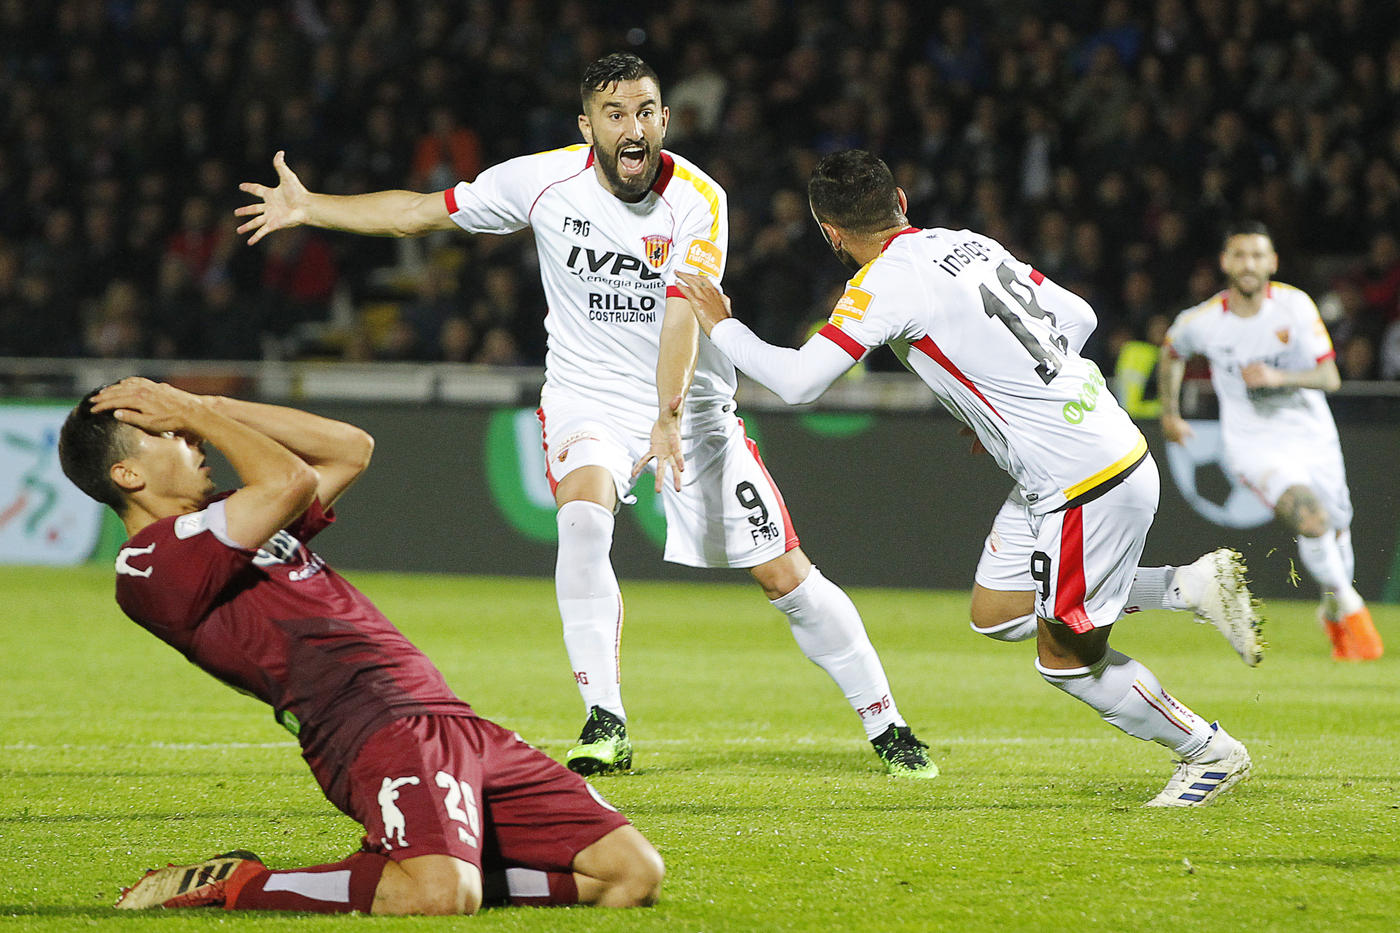 Playoff Serie B: Cittadella-Benevento 1-2